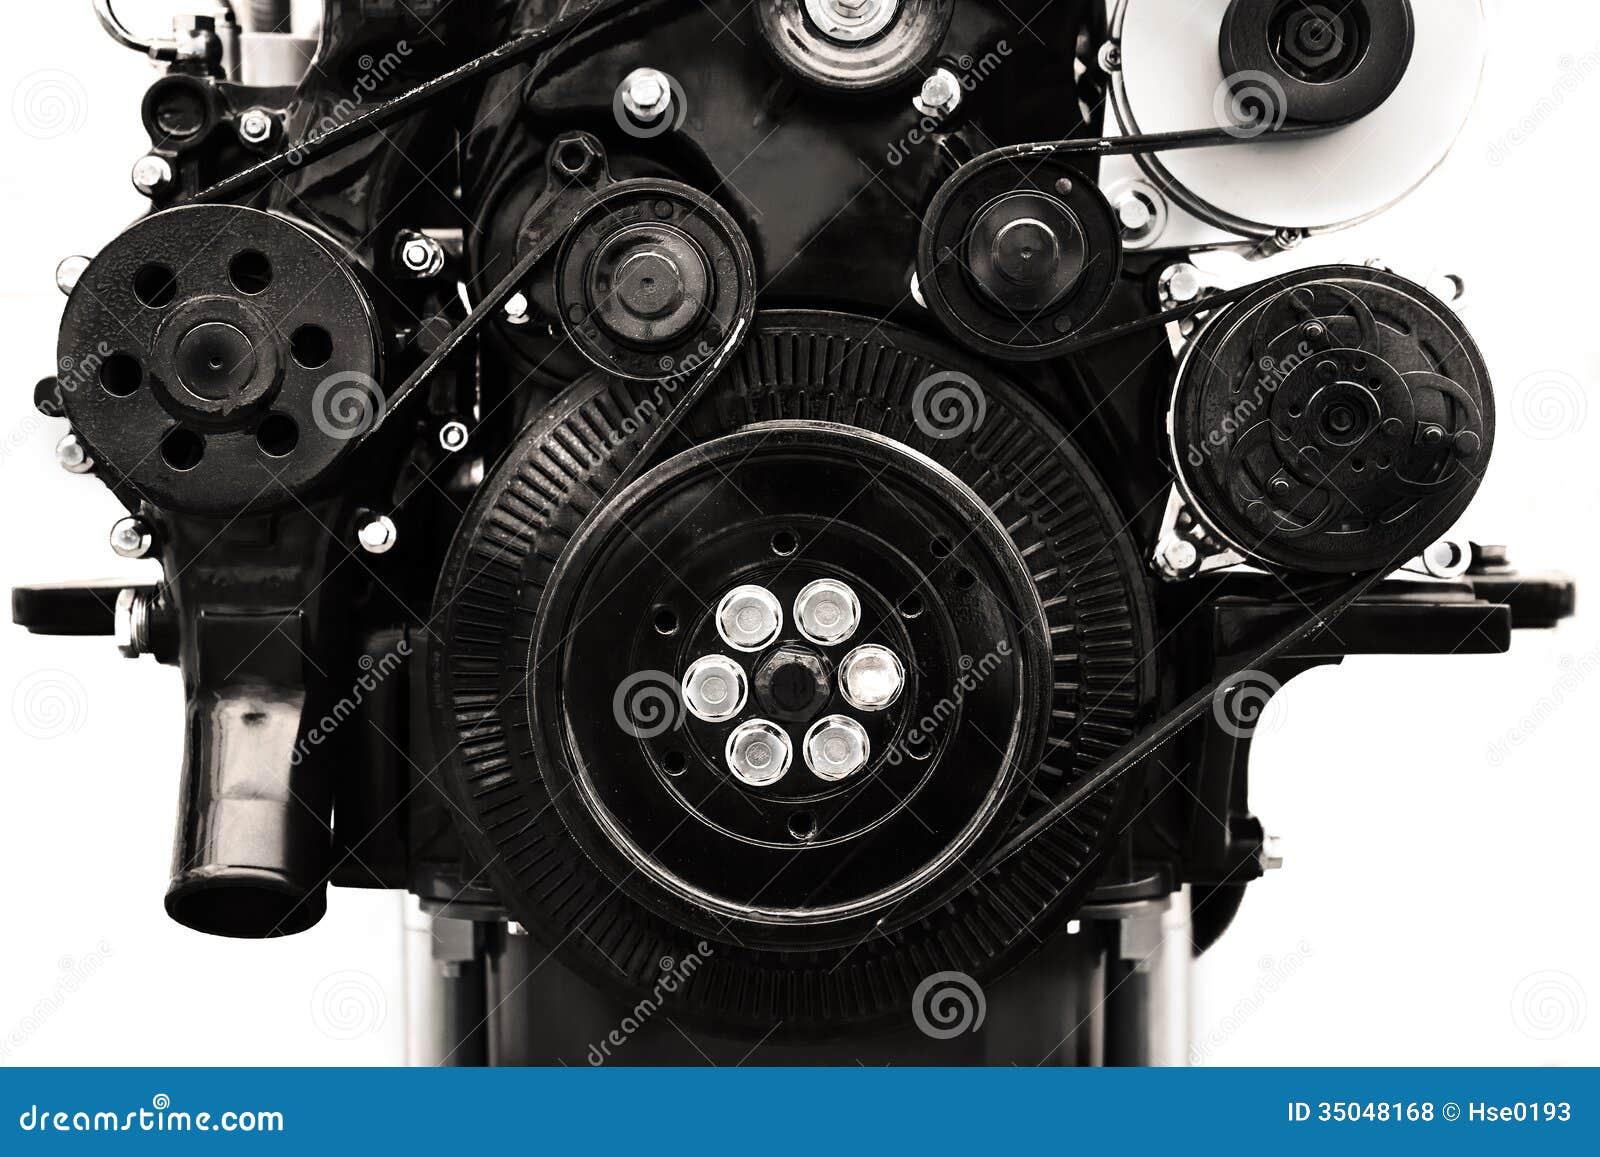 diesel engine transmission royalty free stock photos image 35048168. Black Bedroom Furniture Sets. Home Design Ideas